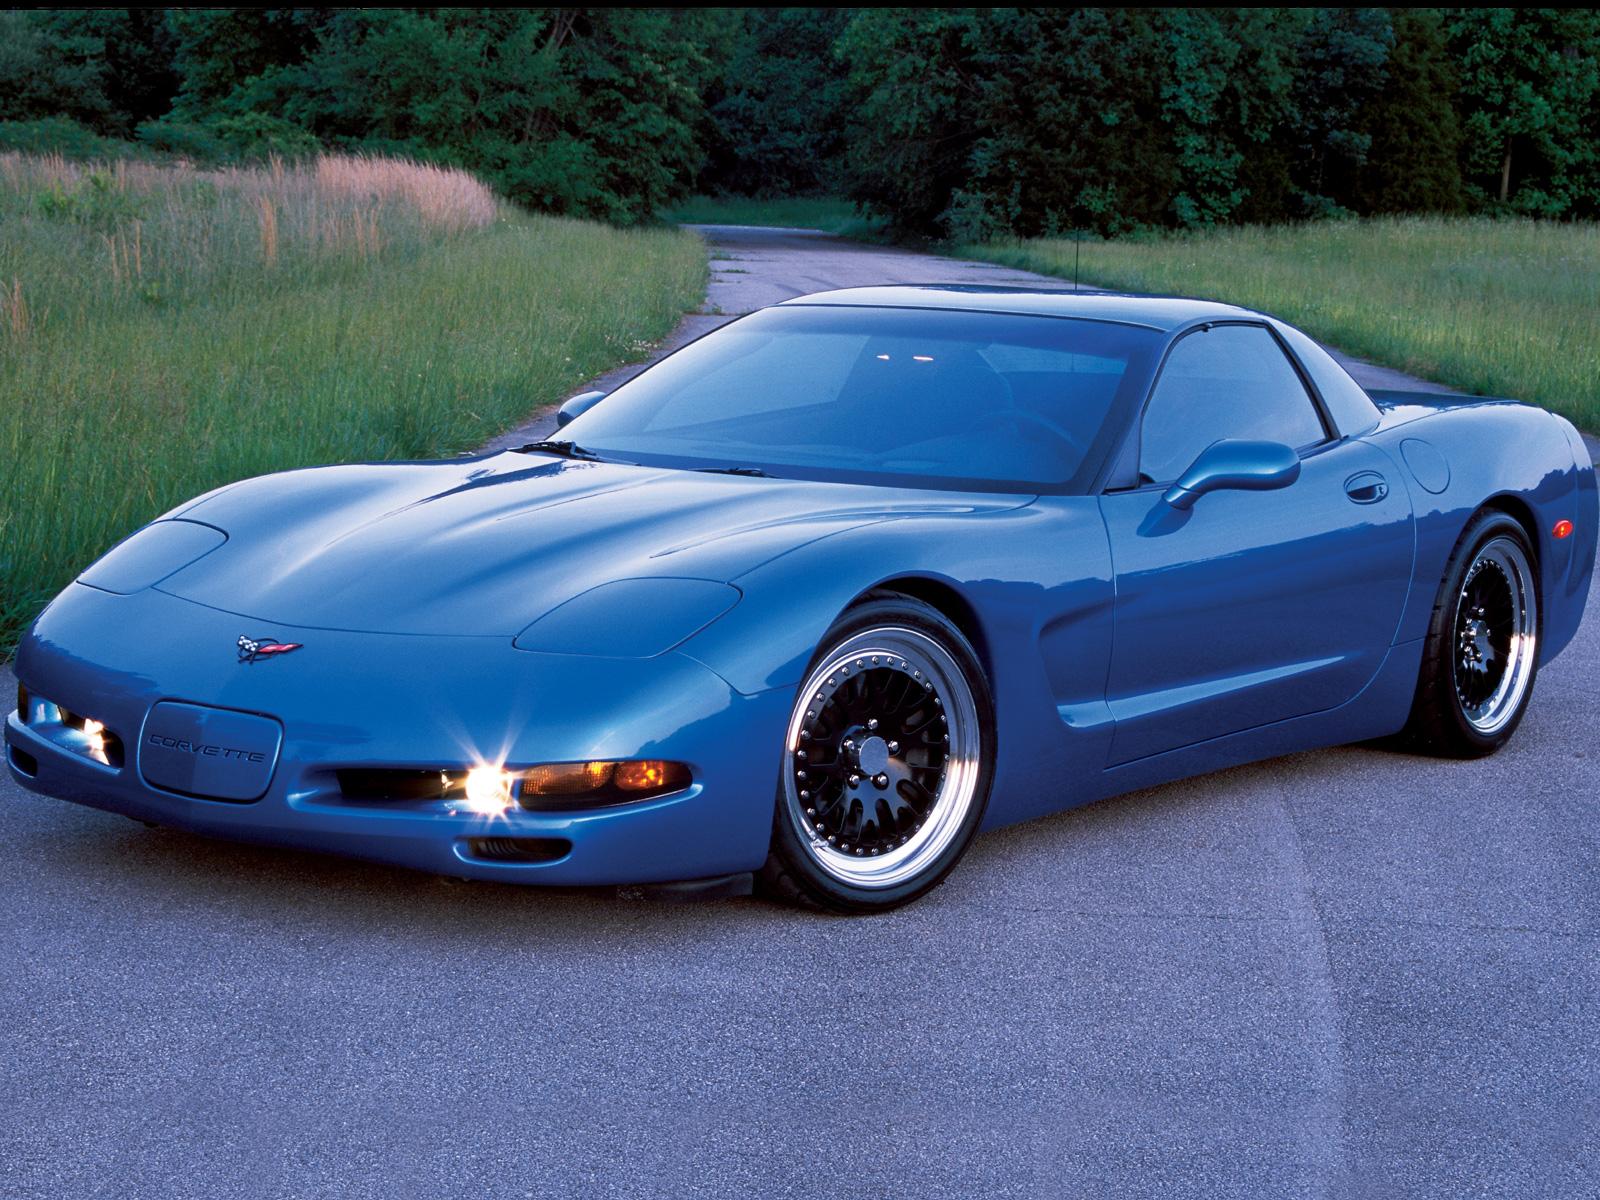 2000 Chevrolet Corvette   Automotive Emeril Photo Gallery 1600x1200